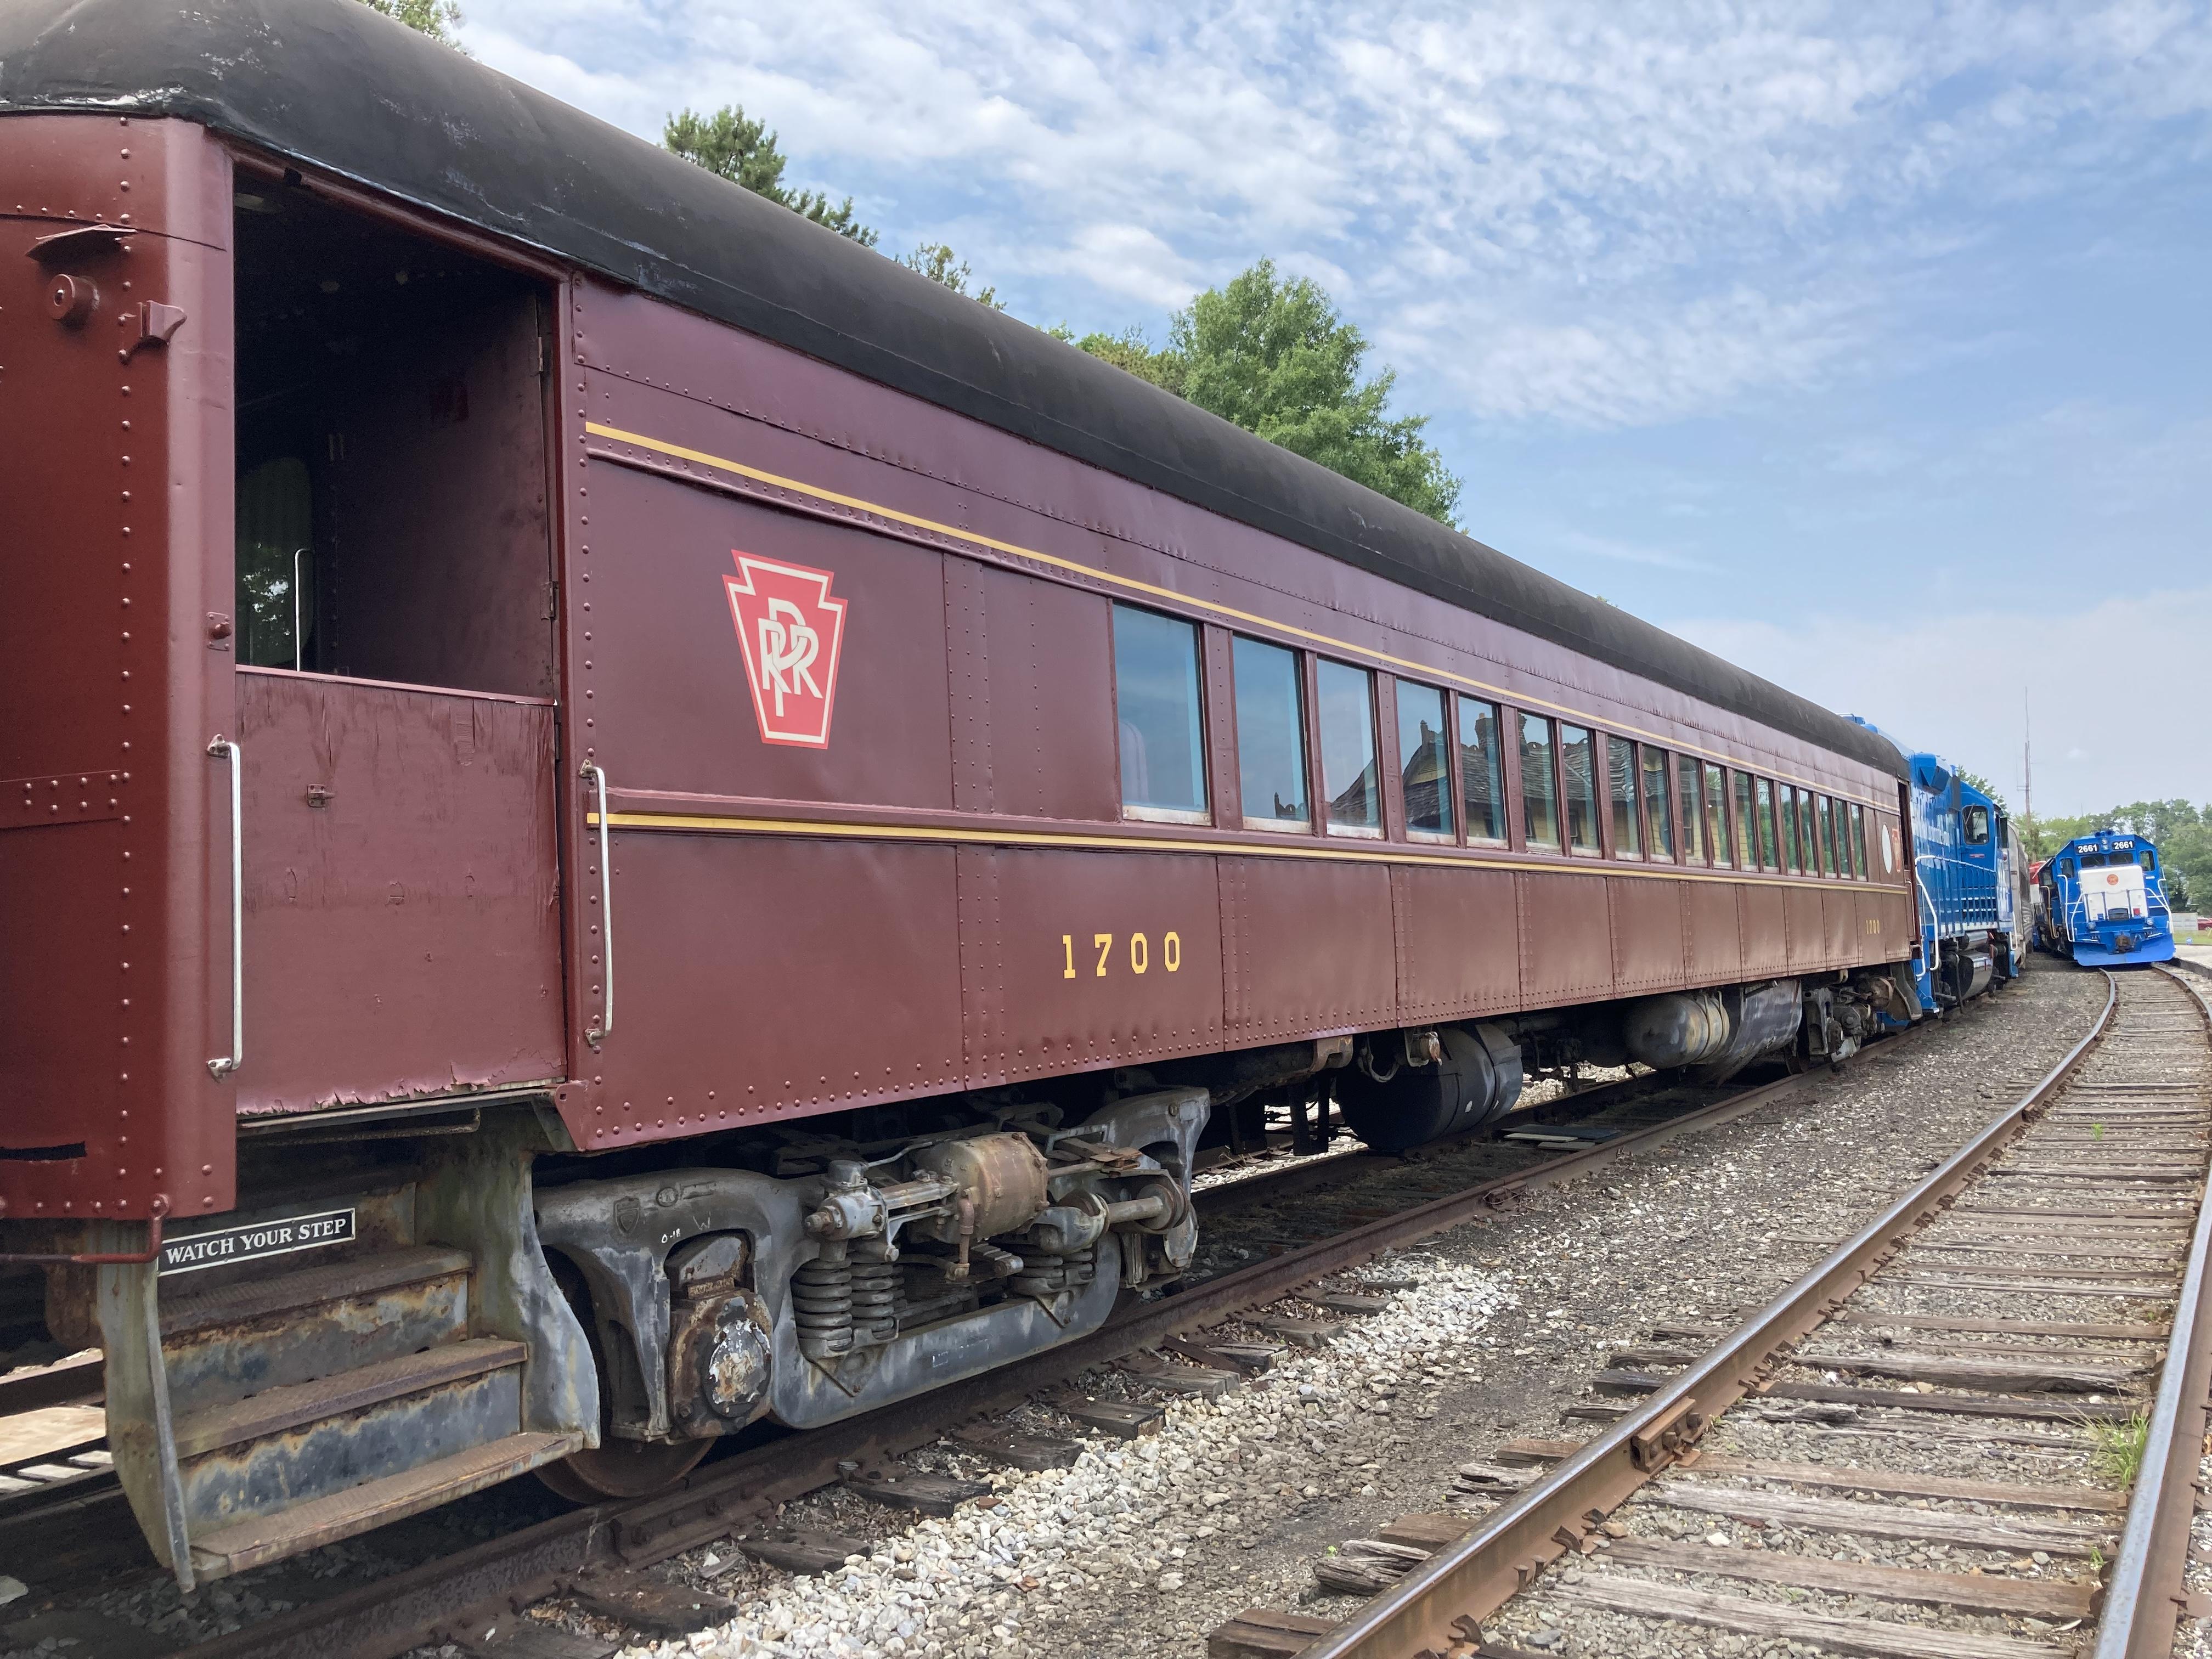 Pennsylvania Rail Road passenger car parked in train yard.